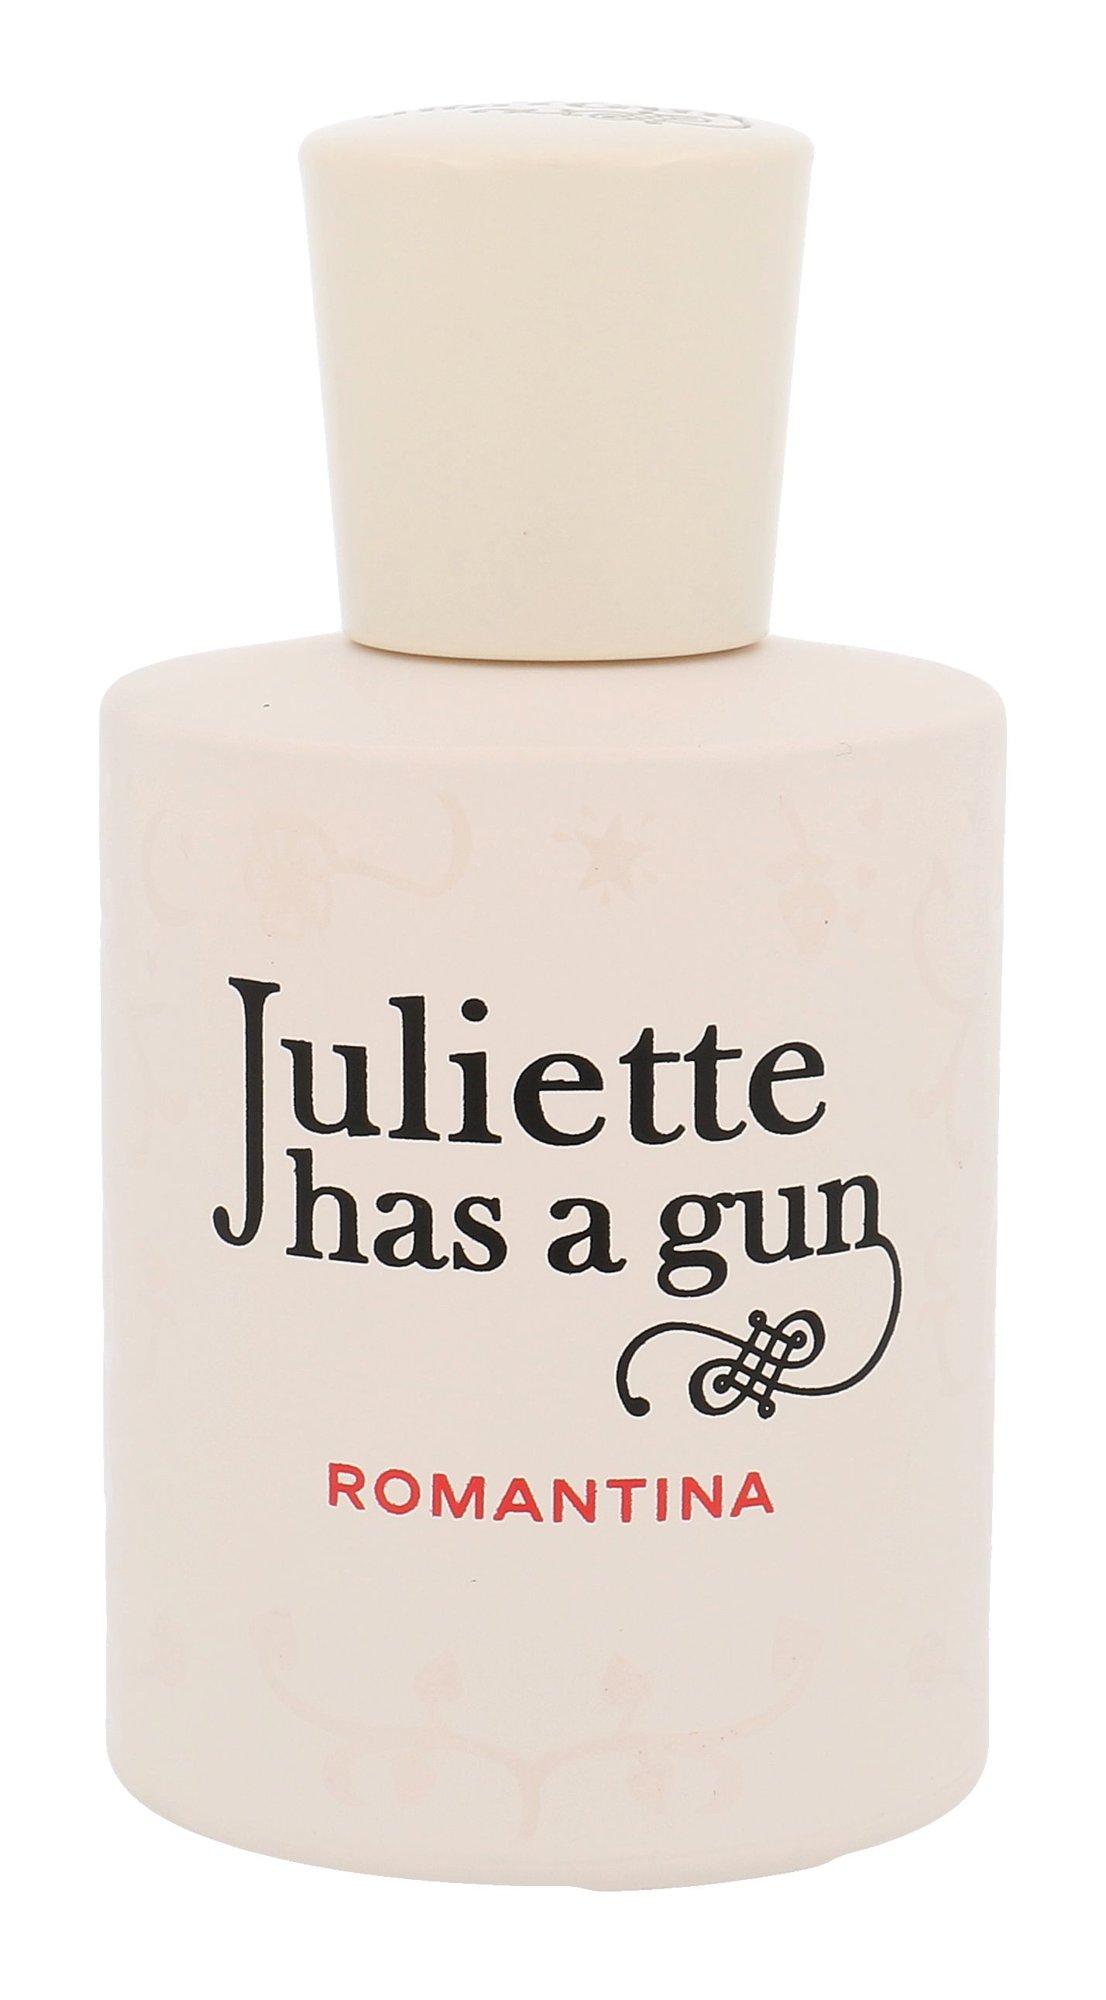 Juliette Has A Gun Romantina Eau de Parfum 50ml